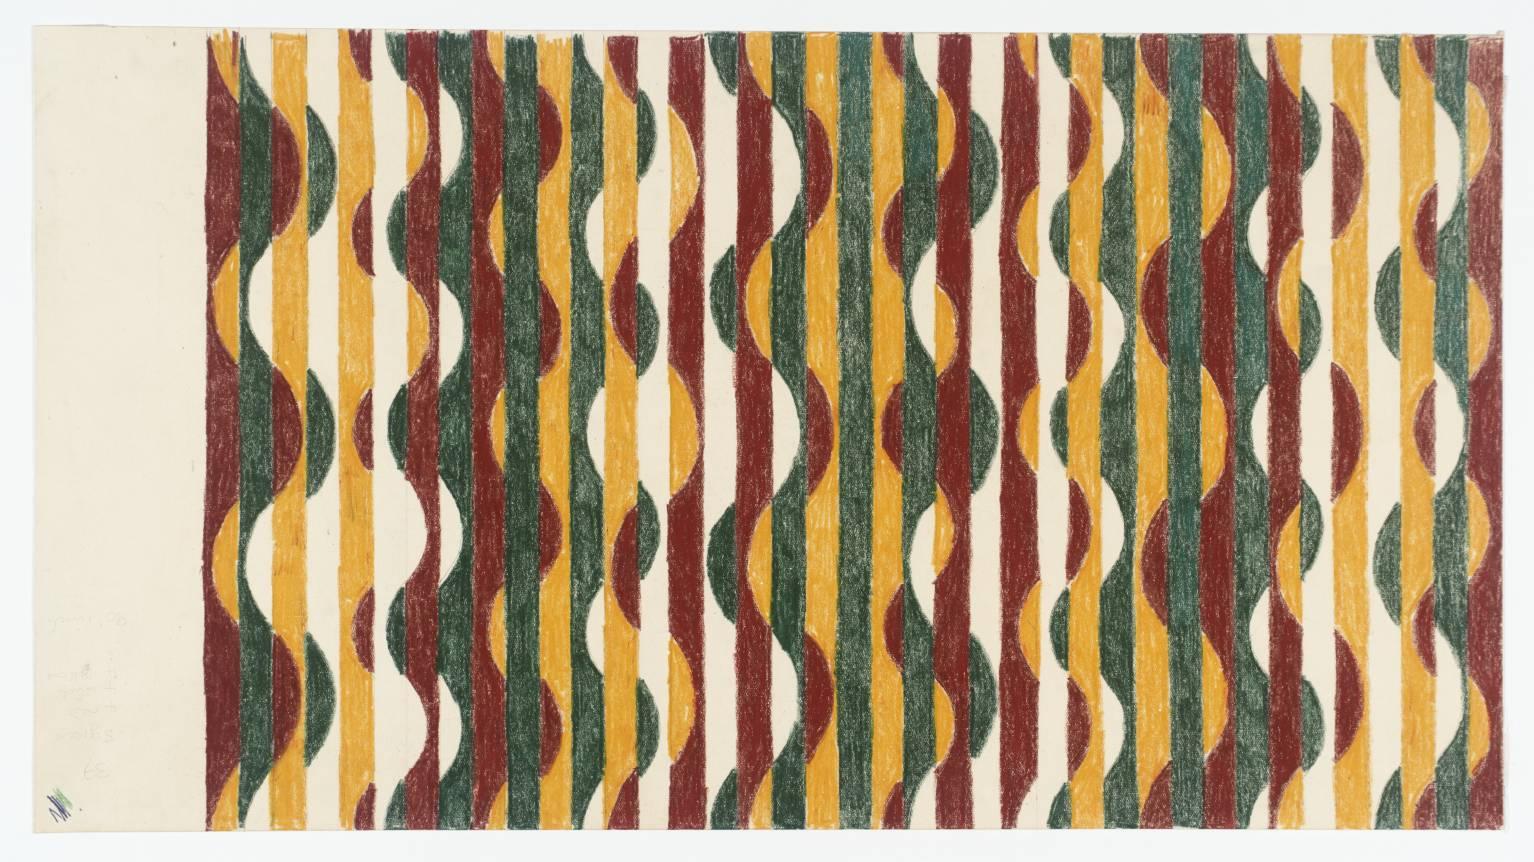 Axion Study ,1965, Michael Kidner, flowersgallery